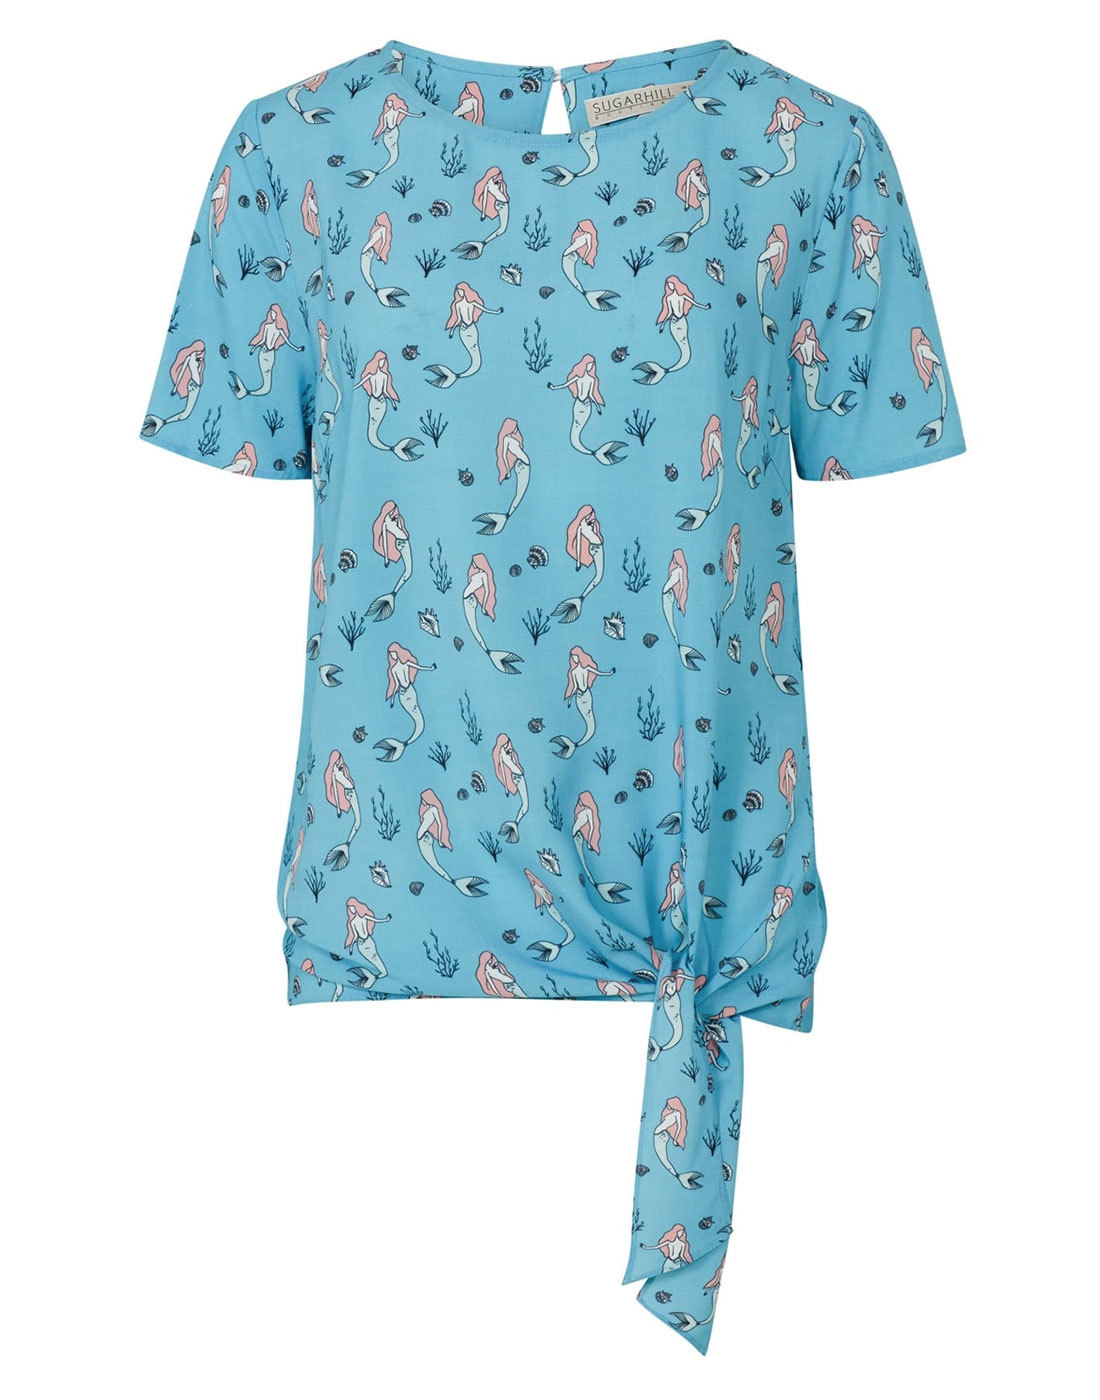 Zia SUGARHILL BOUTIQUE Retro Mermaid Print Tie Top